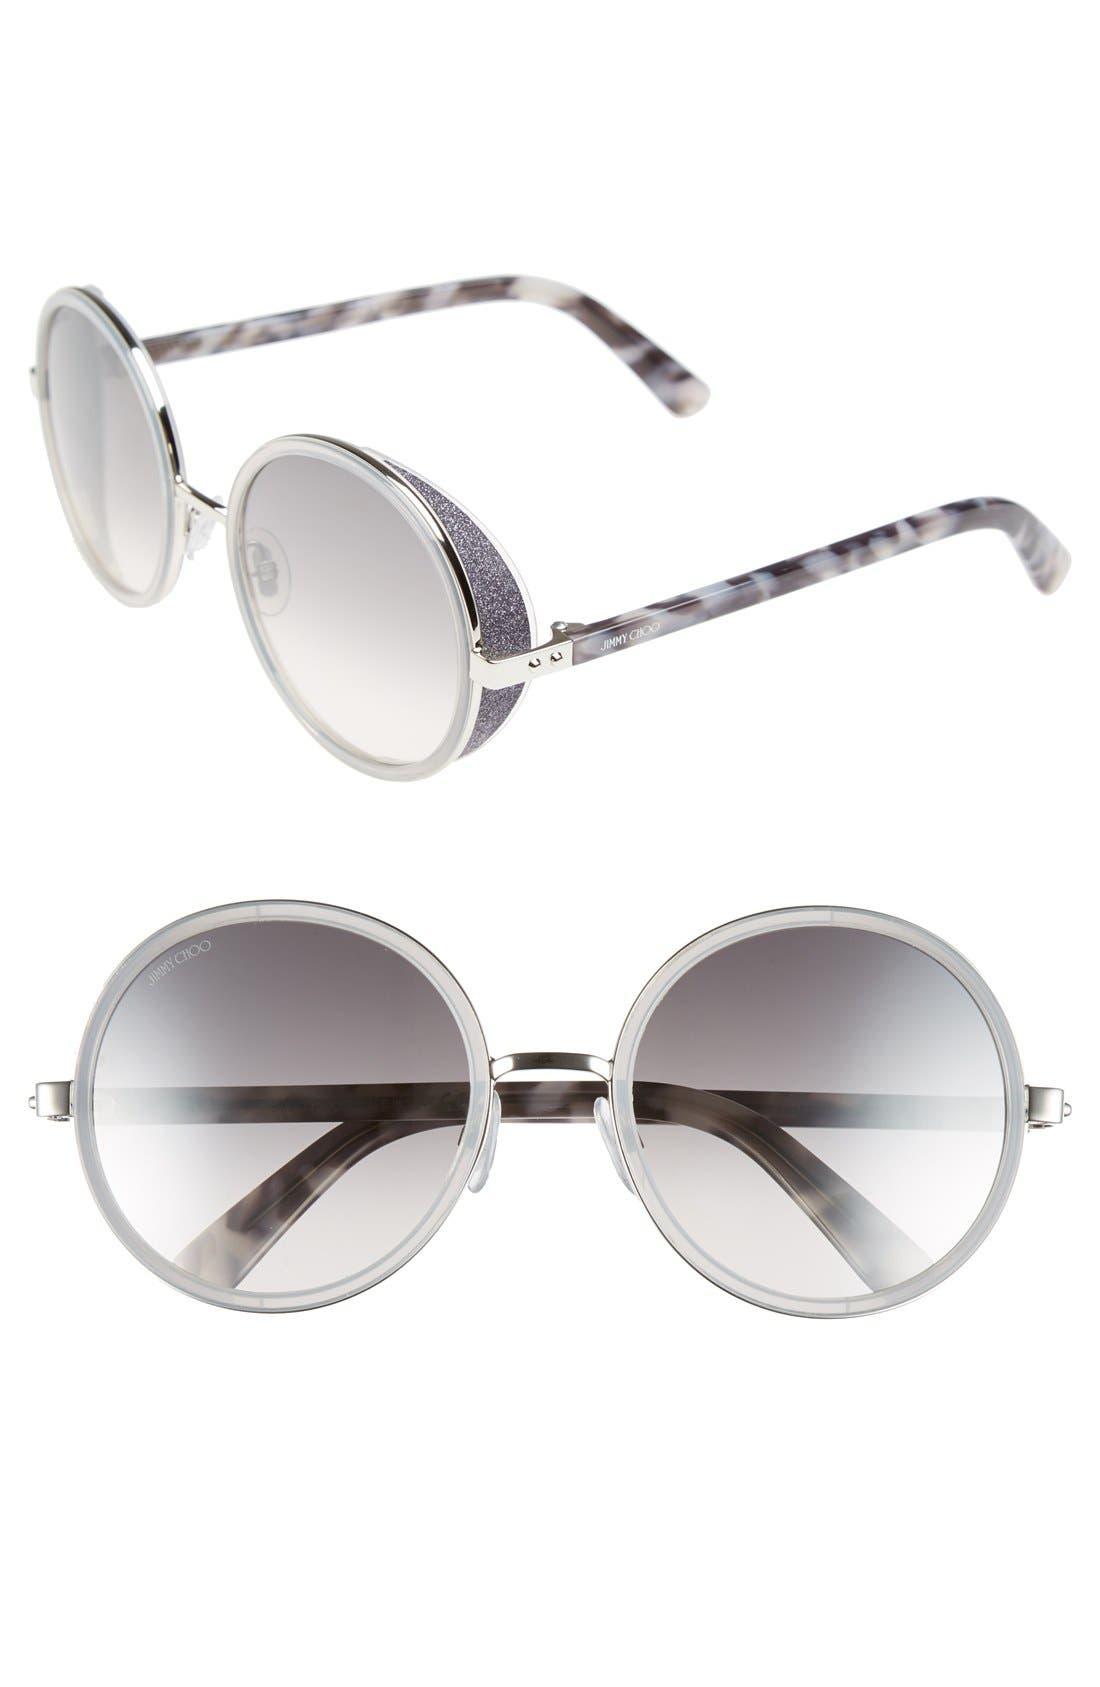 Alternate Image 1 Selected - Jimmy Choo'Andies' 54mm Round Sunglasses